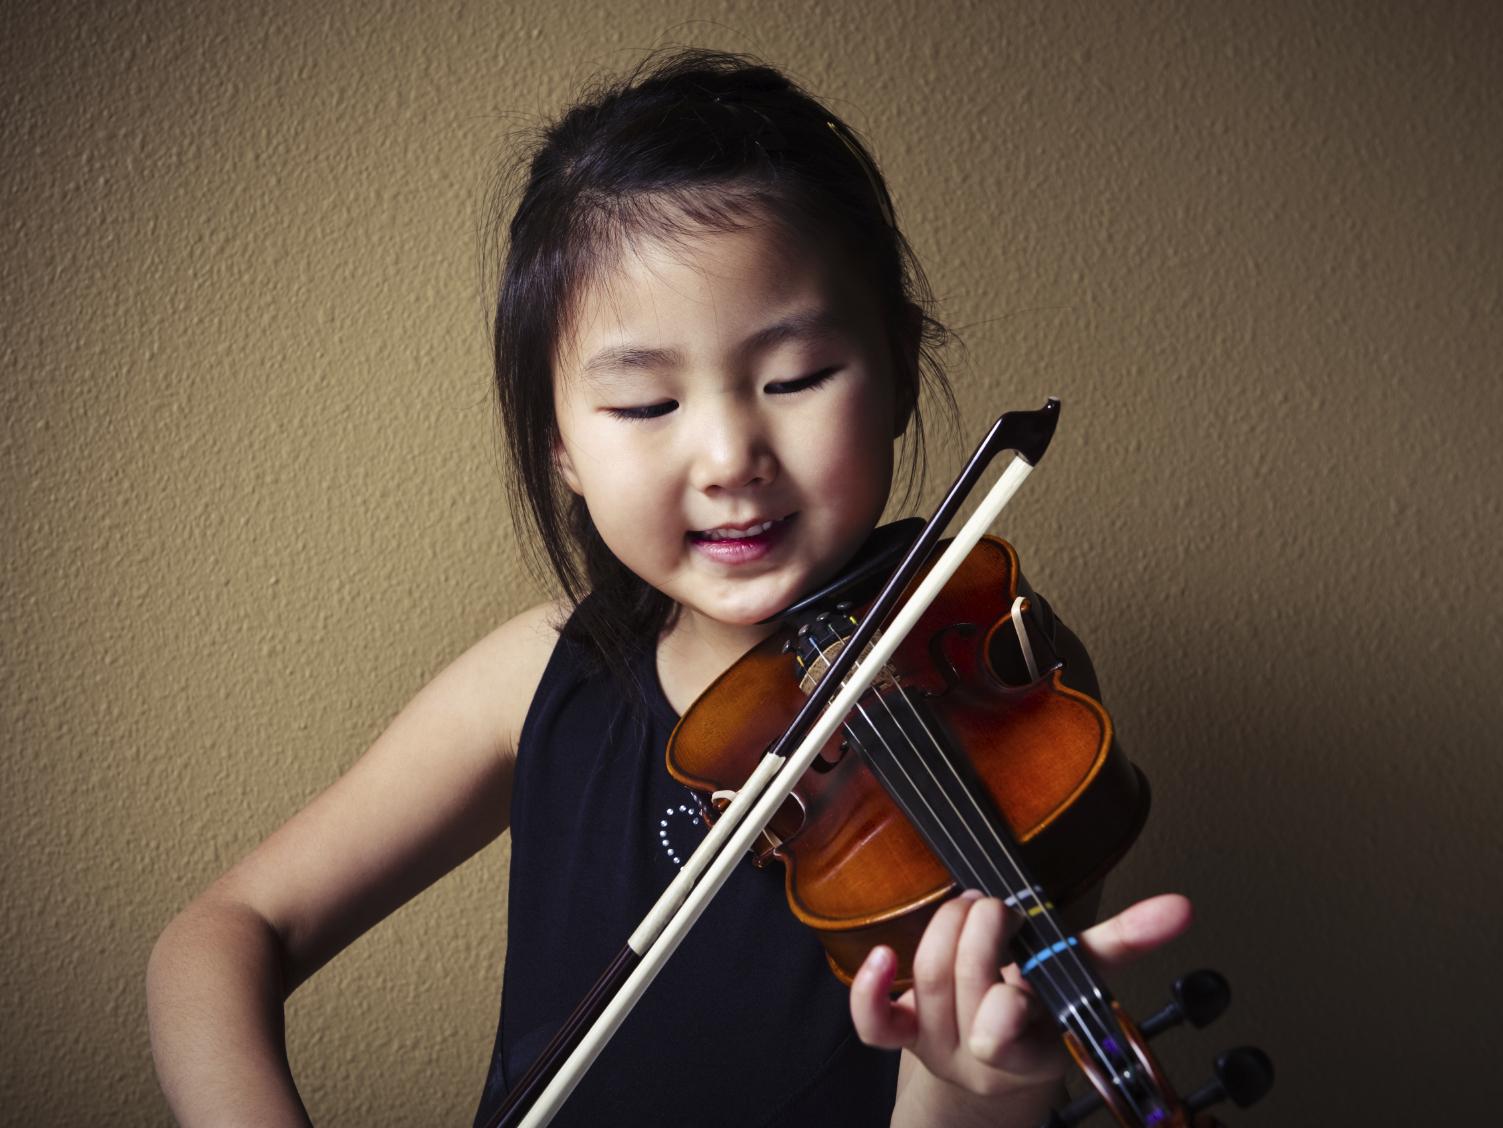 Andrea Echeverri: Getting Kids To Practice Music